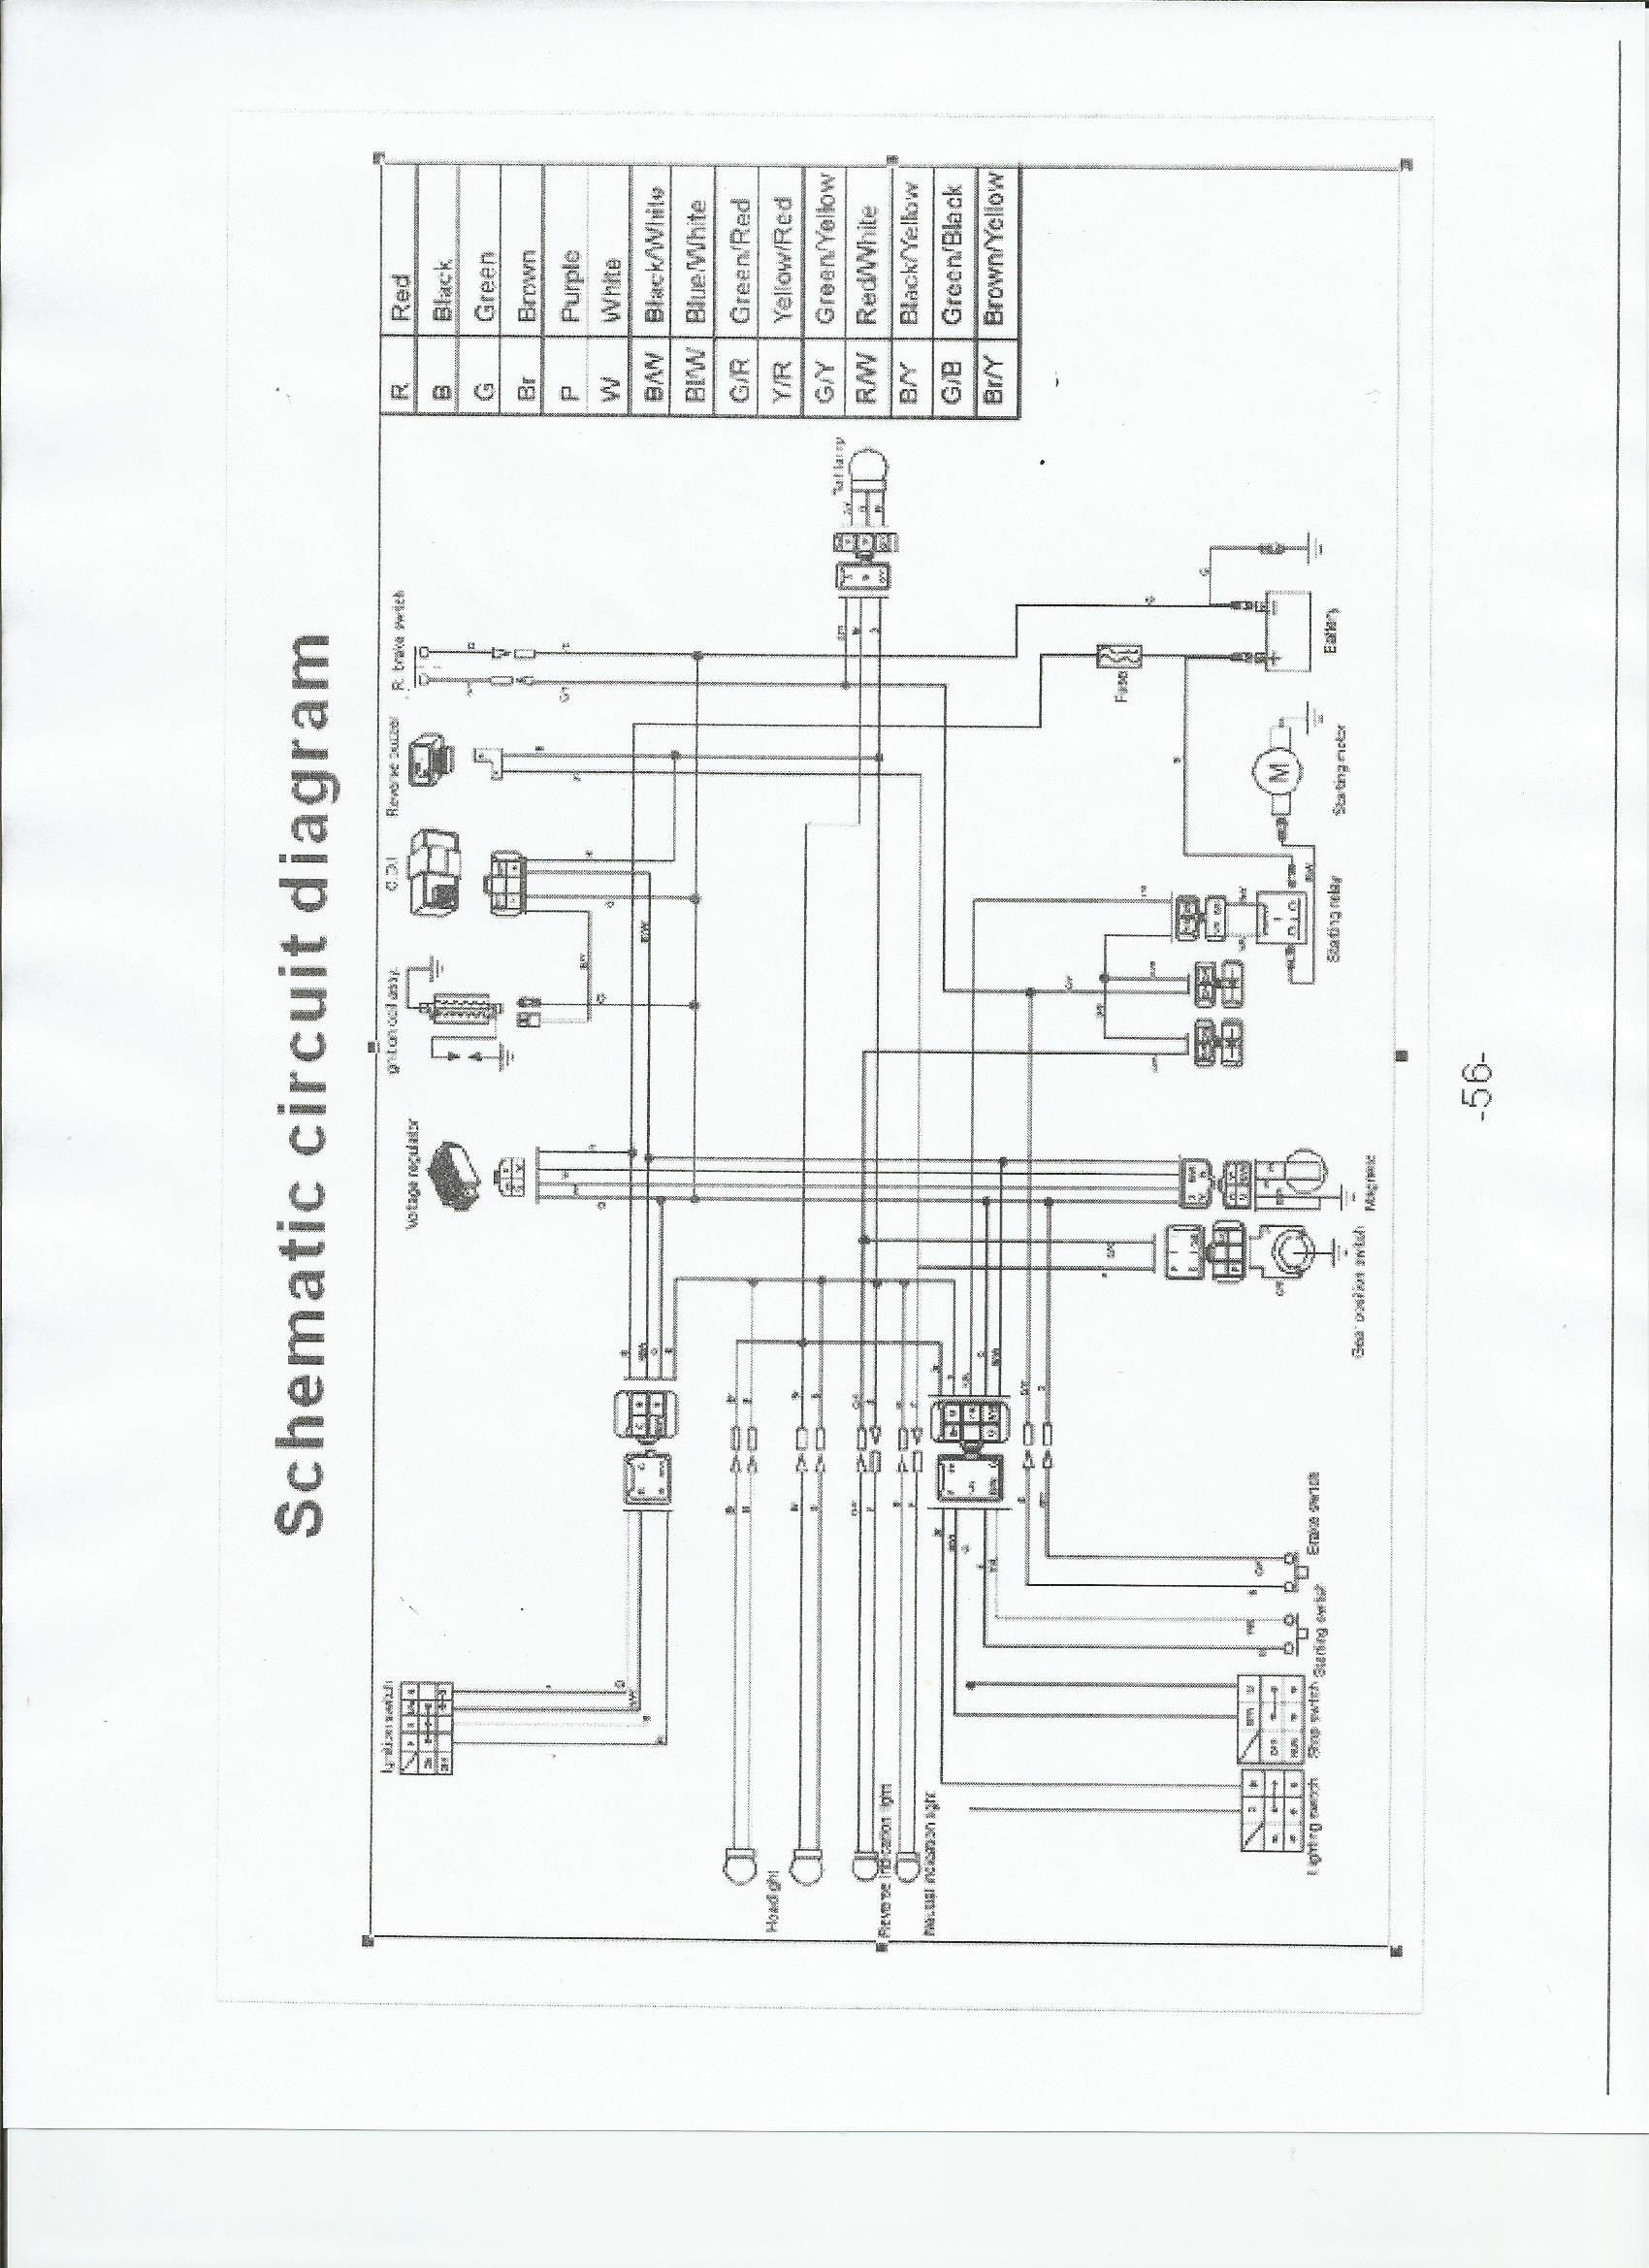 Tao Tao 110 Wiring Diagram 110cc Wire Harness Diagram 2004 F150 Dlc Wiring Diagram Of Tao Tao 110 Wiring Diagram